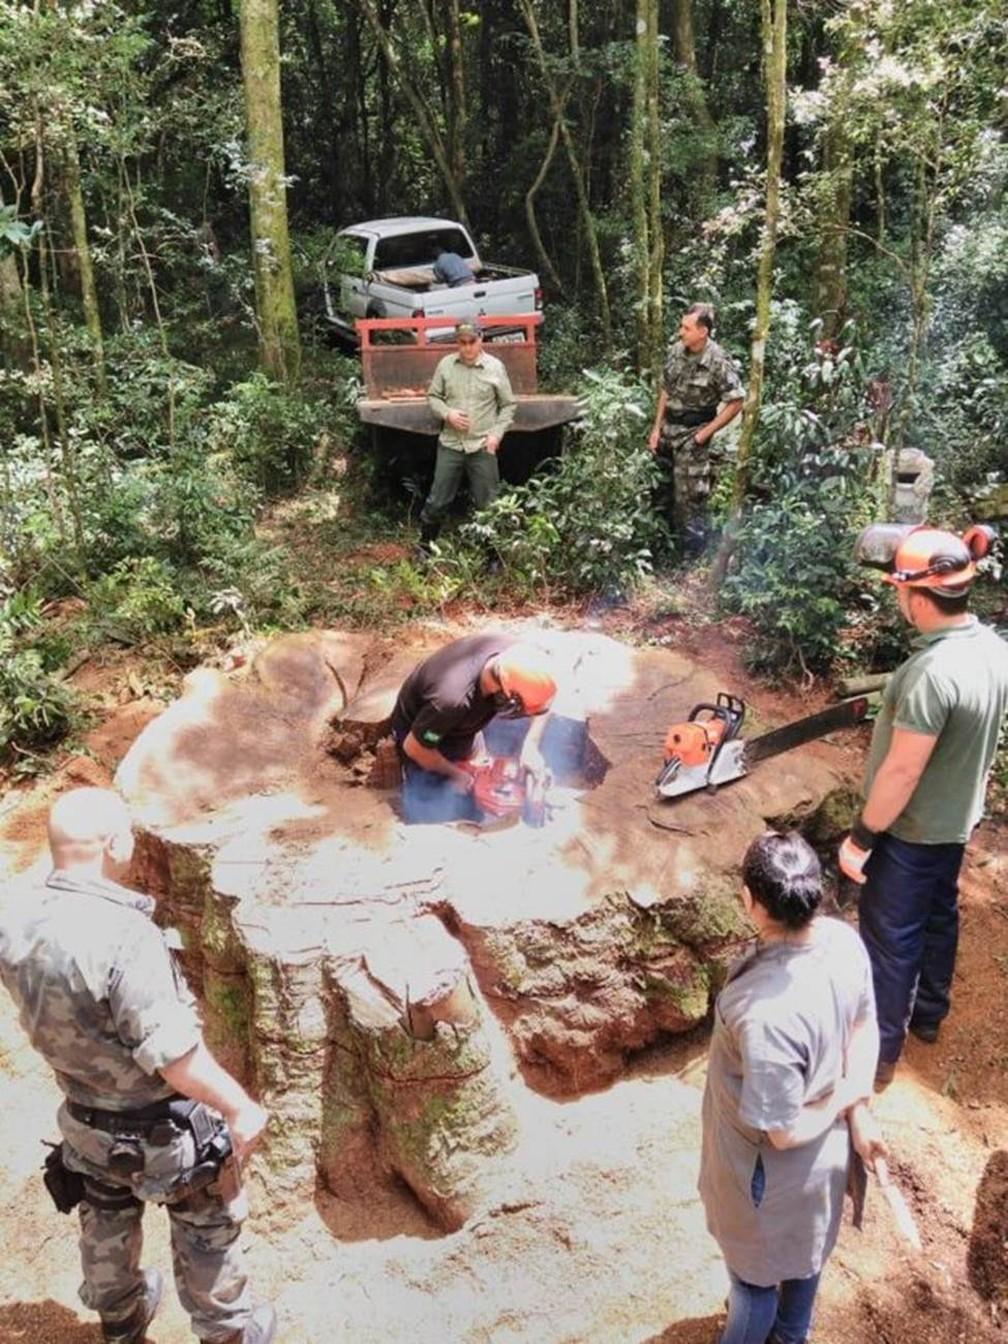 Derrubada ilegal de 17 árvores raras rendeu multa de R$ 12.750 — Foto: Polícia Militar Ambiental de SC